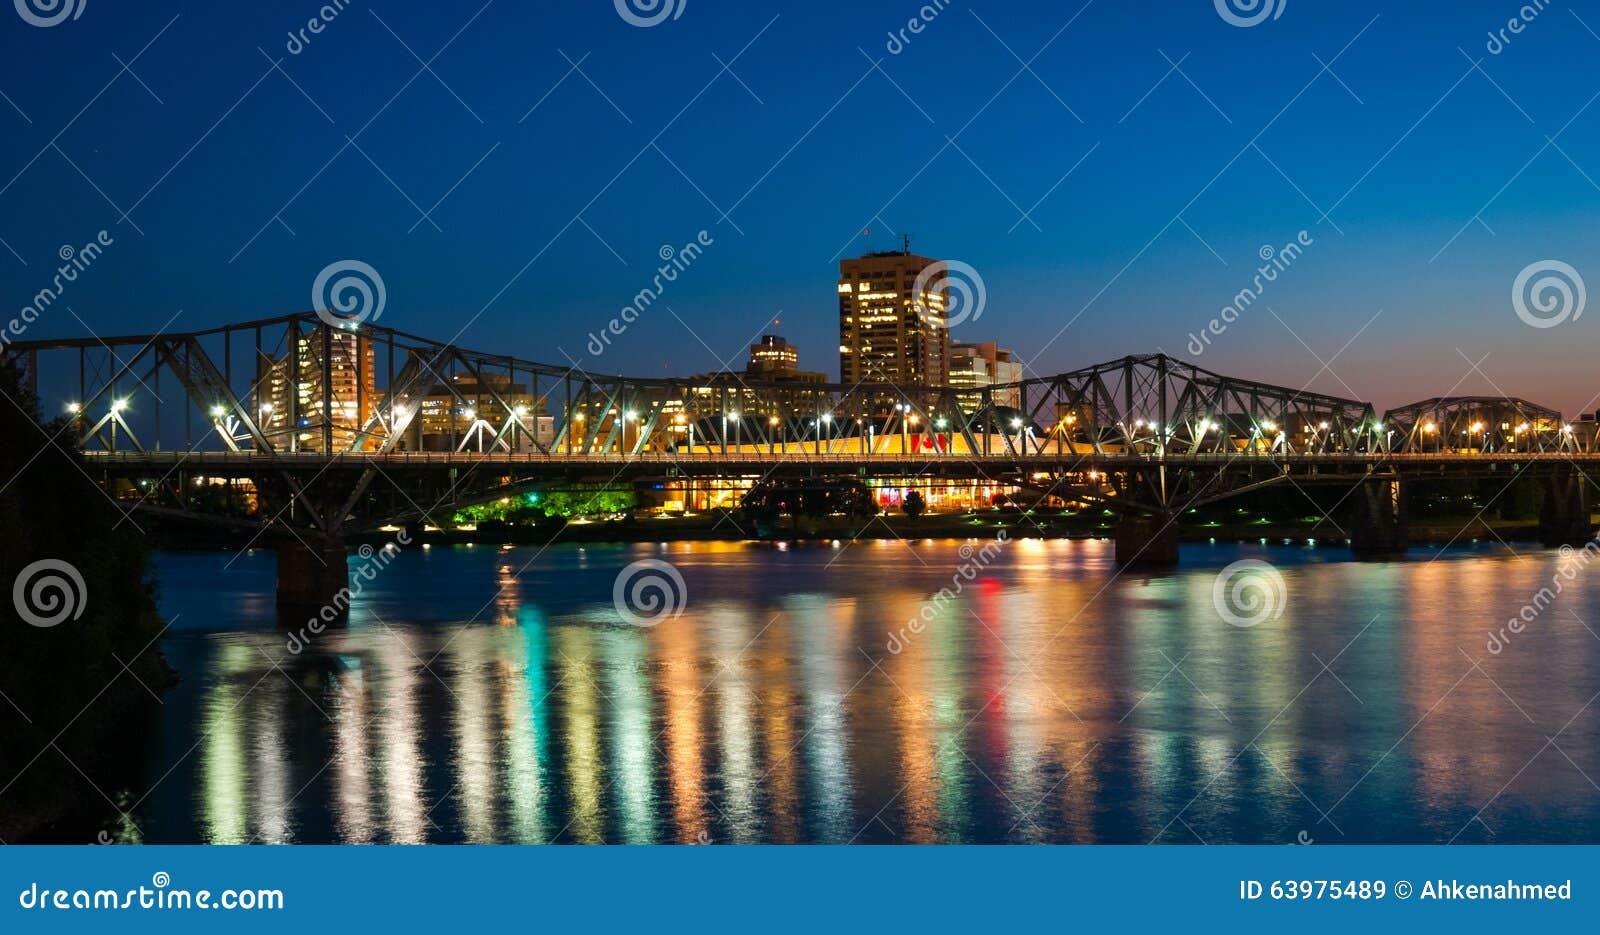 Alexandra rail and traffic bridge at night.